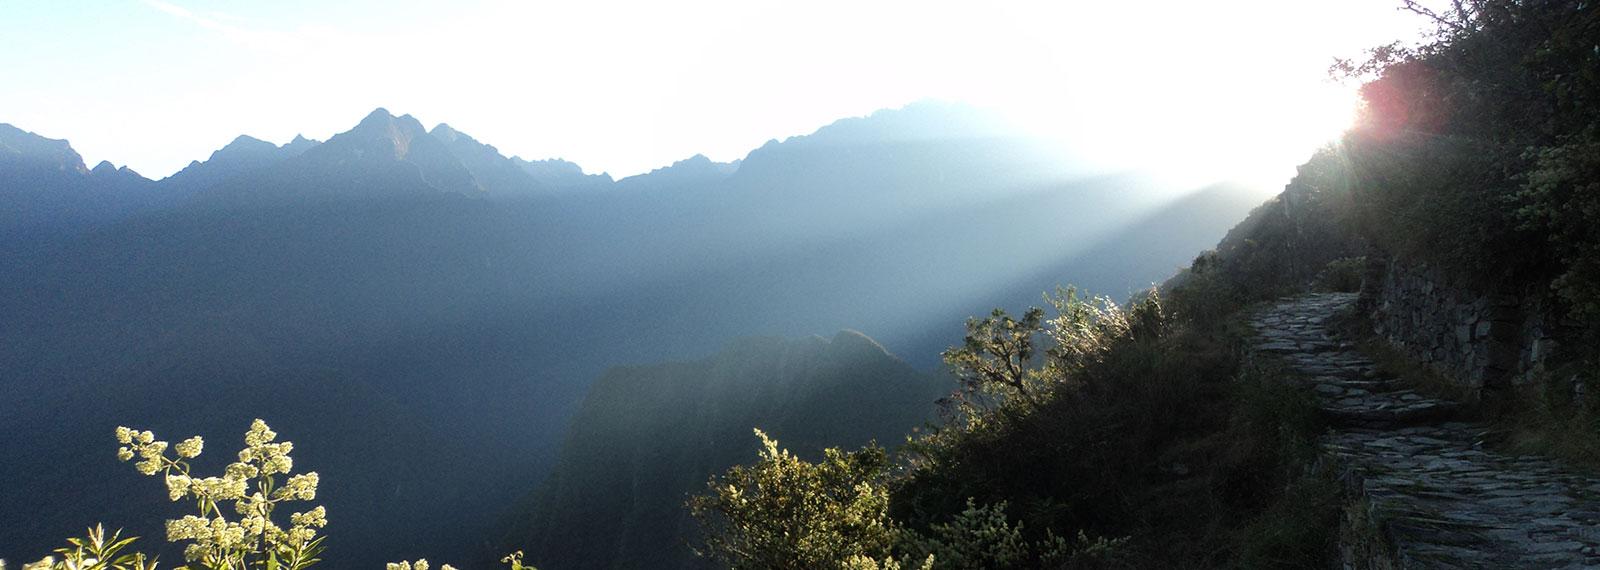 inca trail trek view of machu picchu